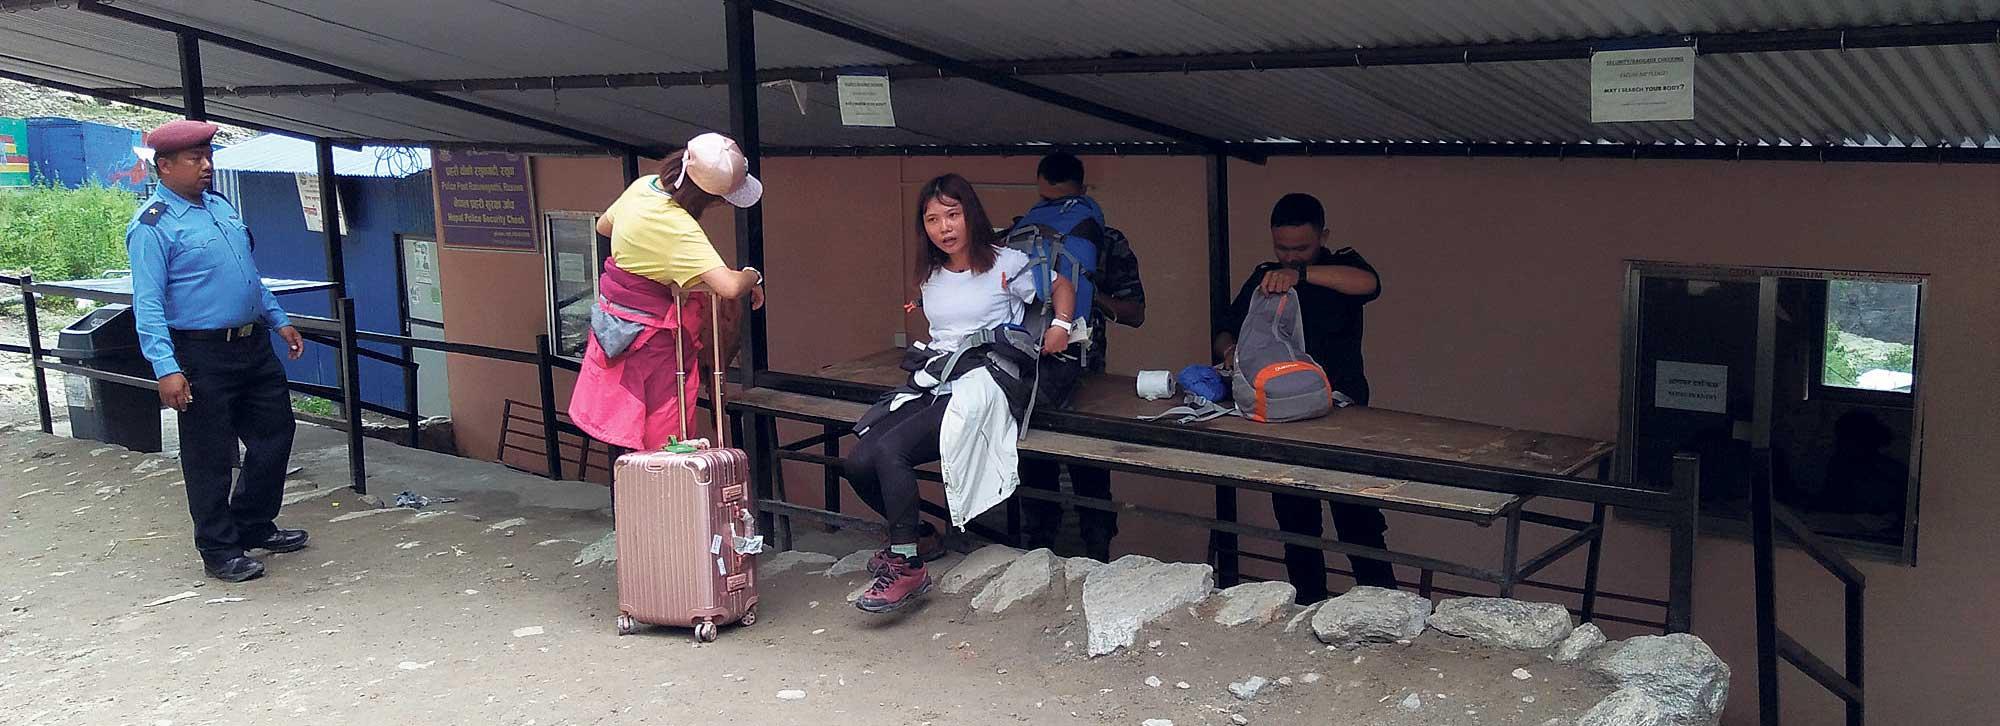 Tourist arrivals via Rasuwagadhi on the rise